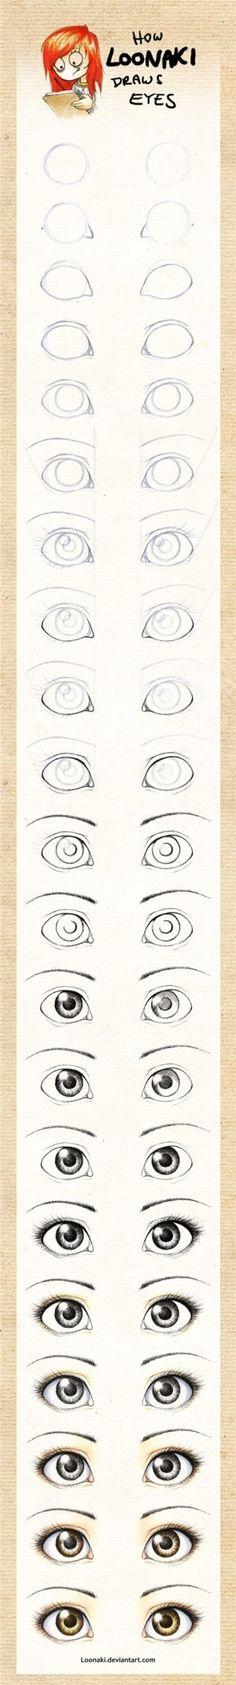 How to draw eyes by TinyCarmen